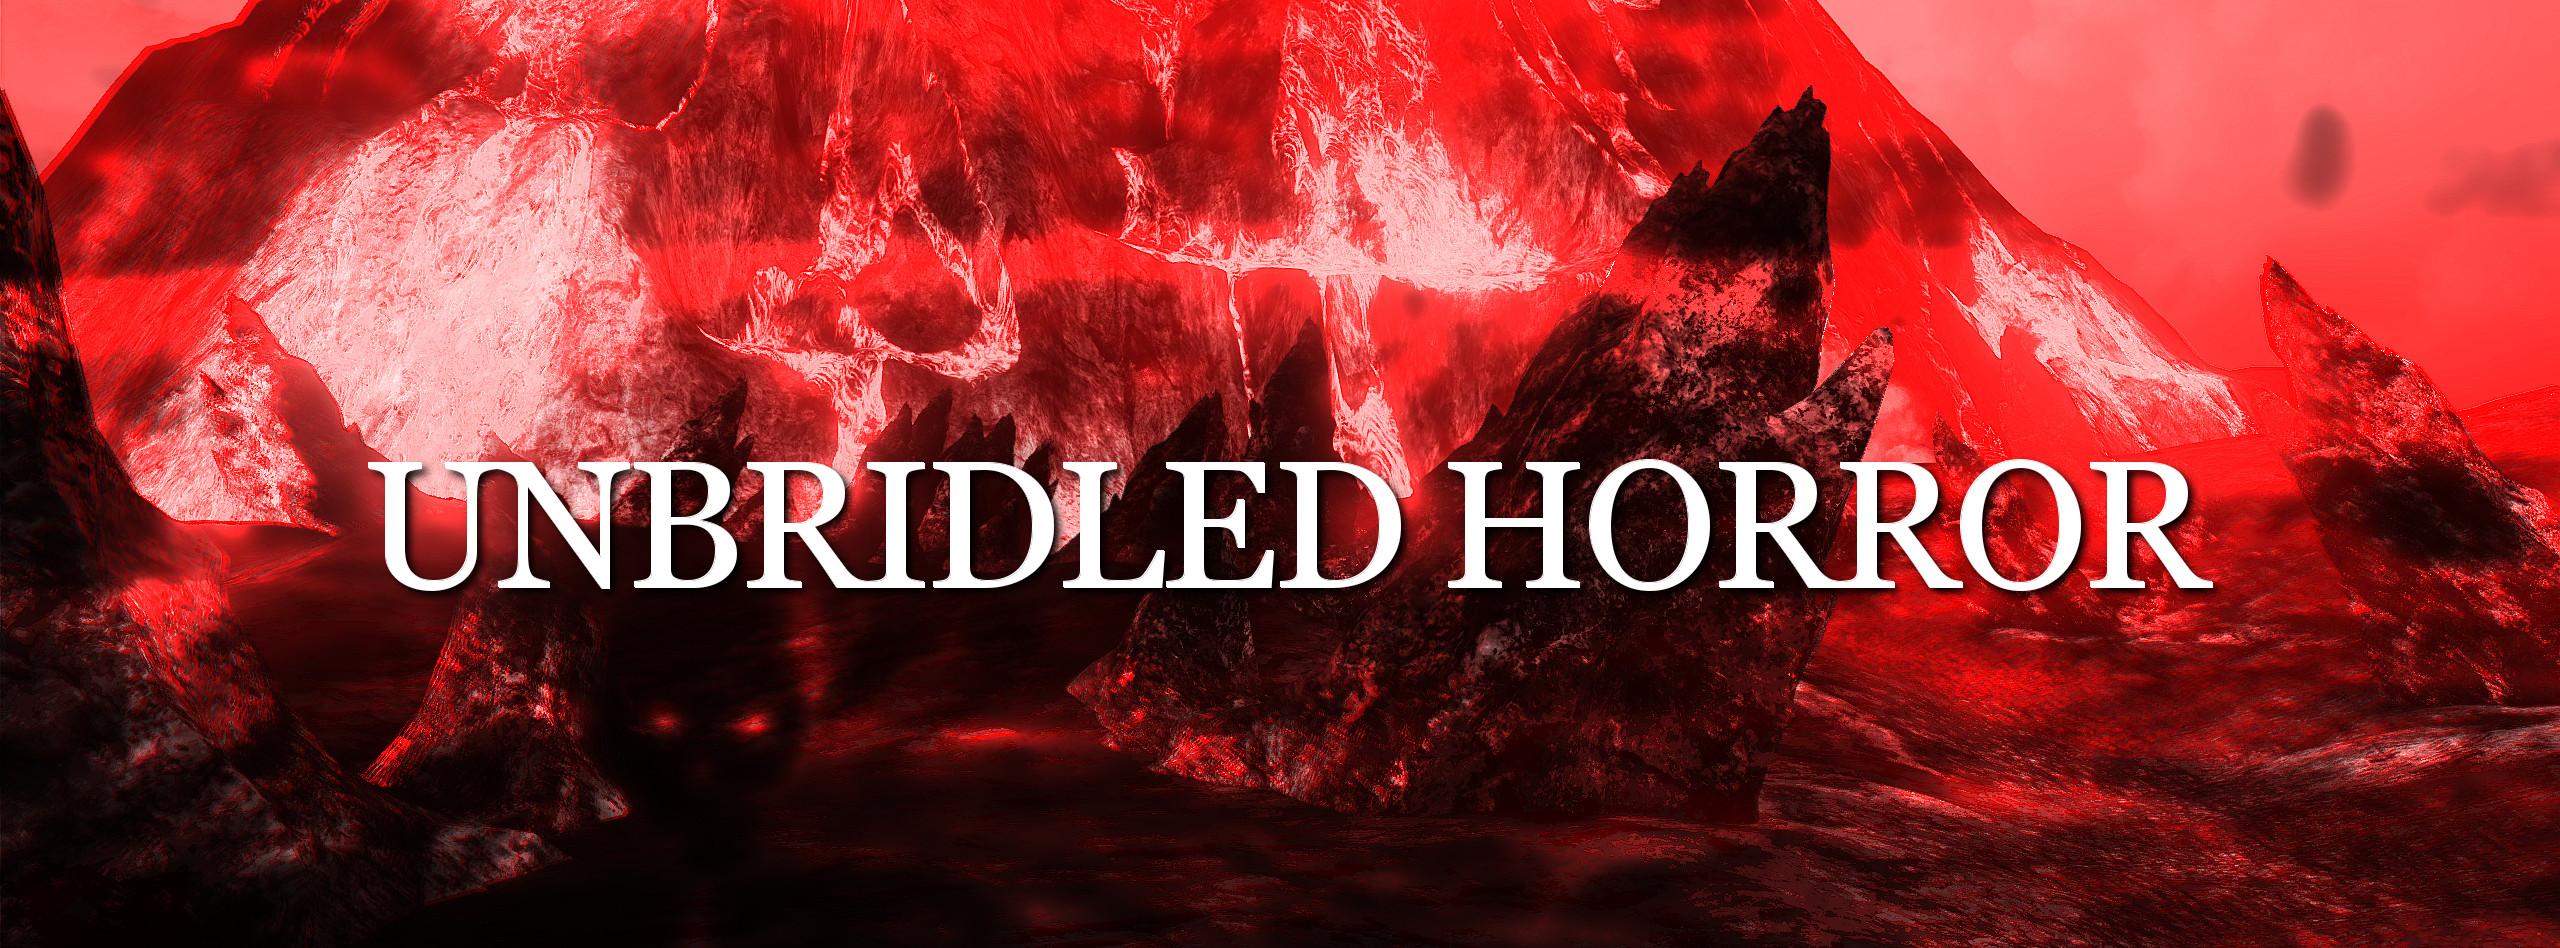 Unbridled Horror - Demo